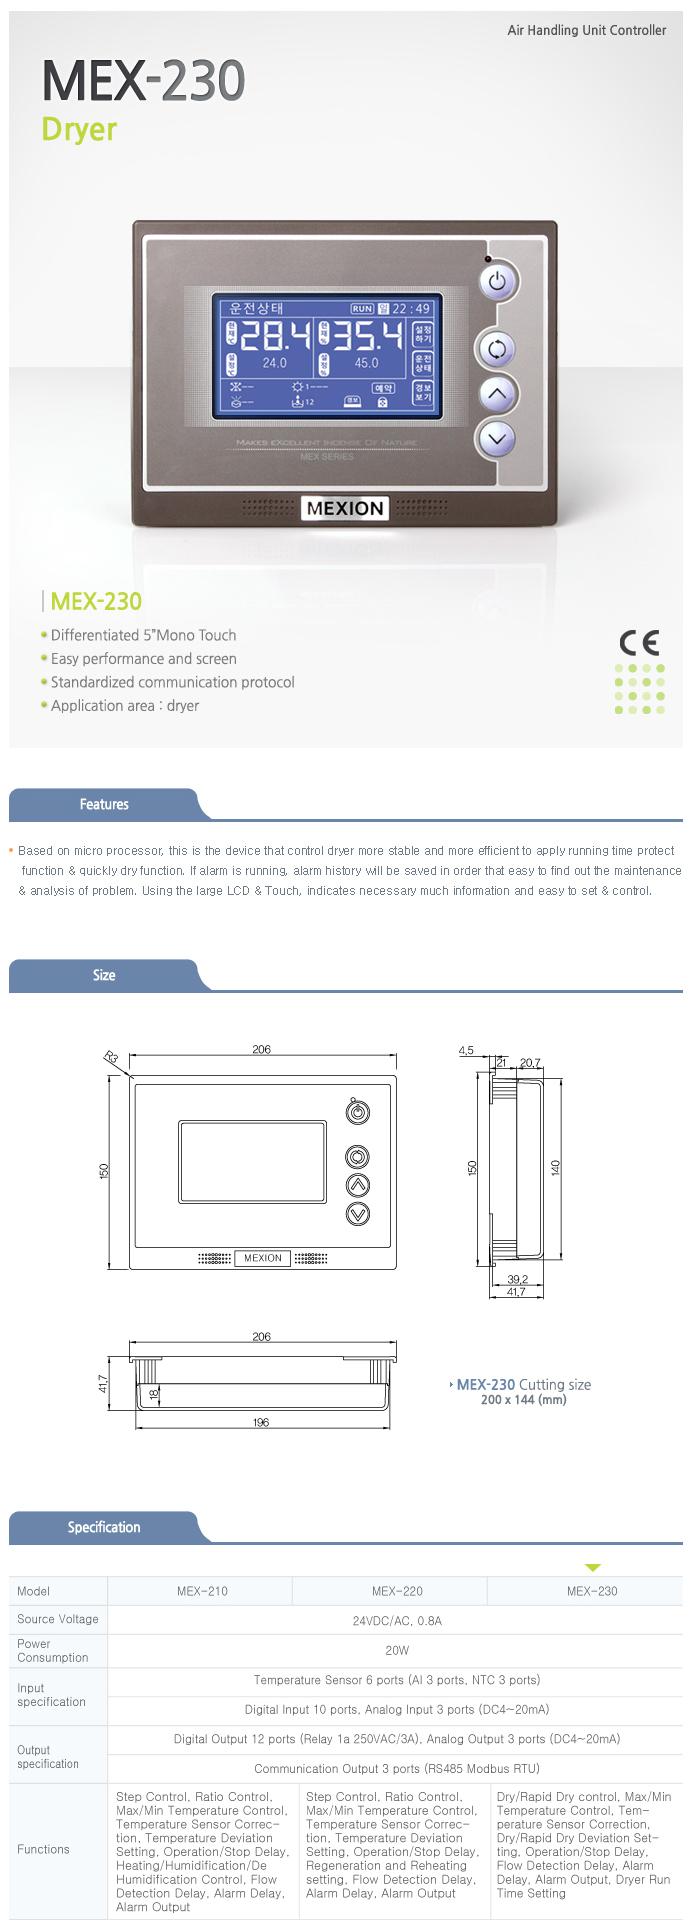 MST Dryer MEX-230